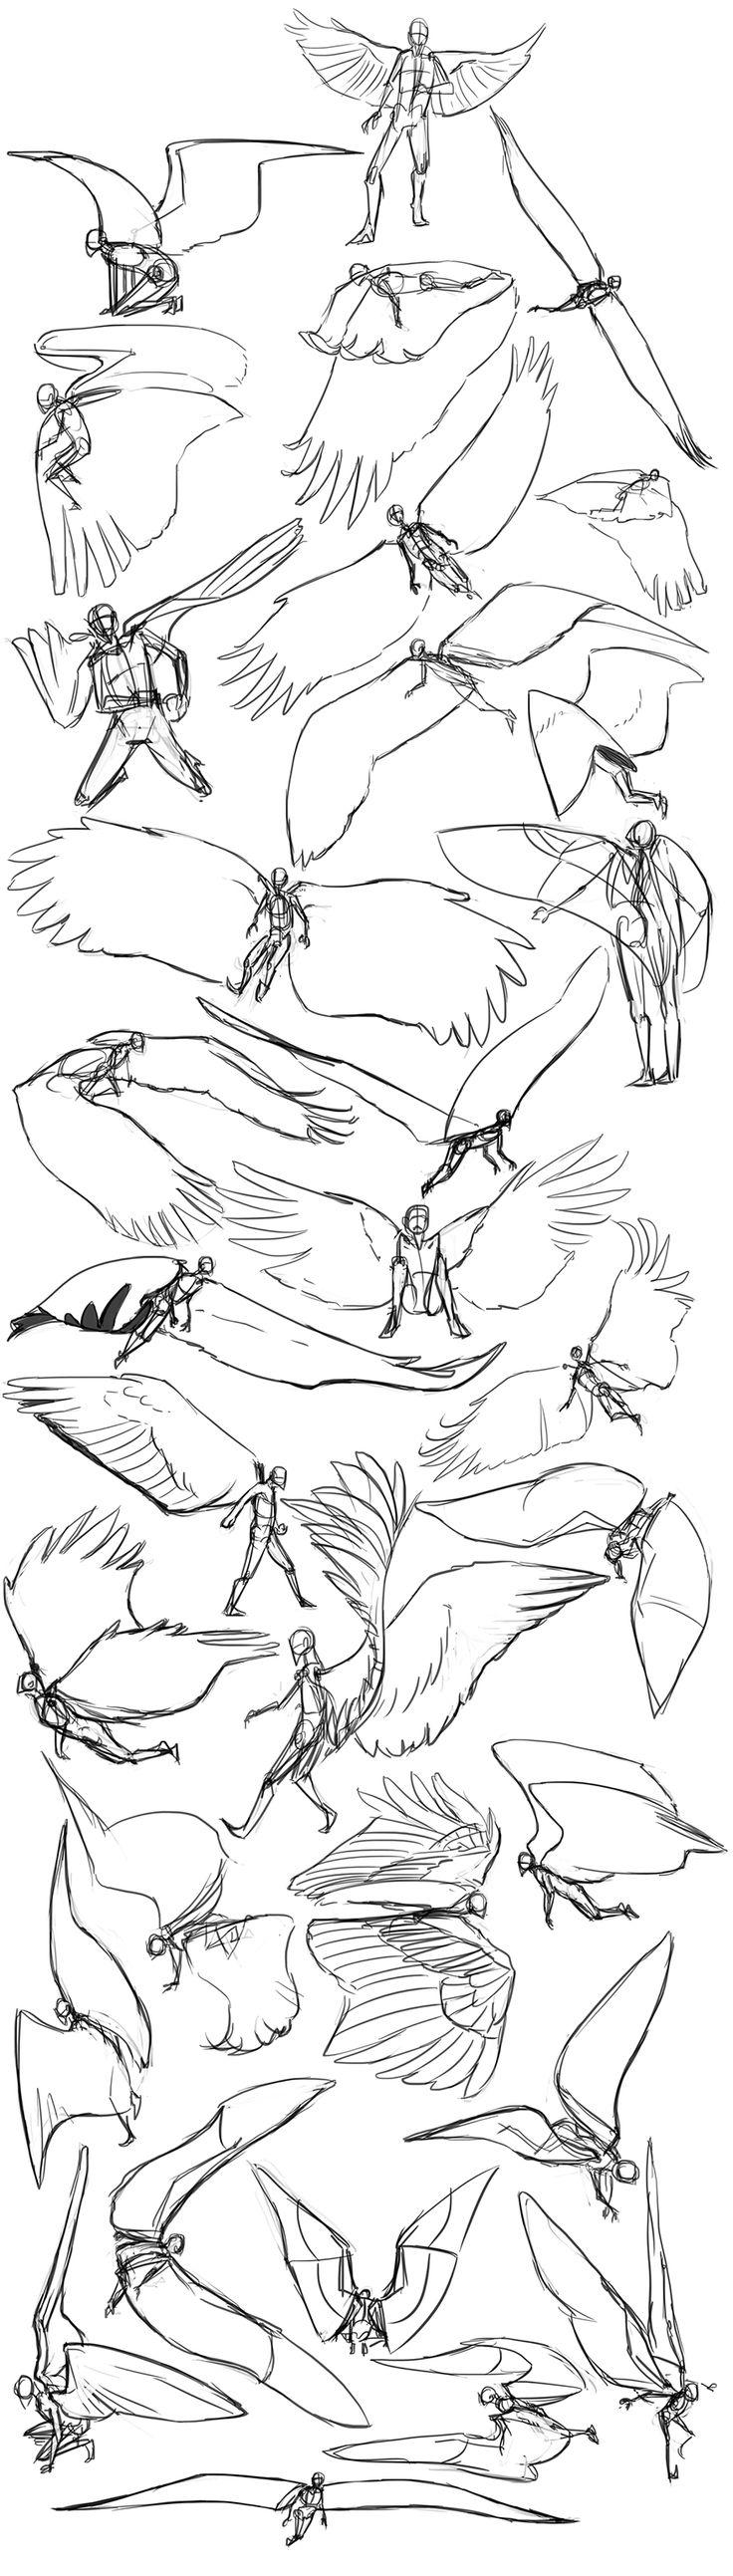 angel wings sketchdump by squidlifecrisis.deviantart.com on @deviantART